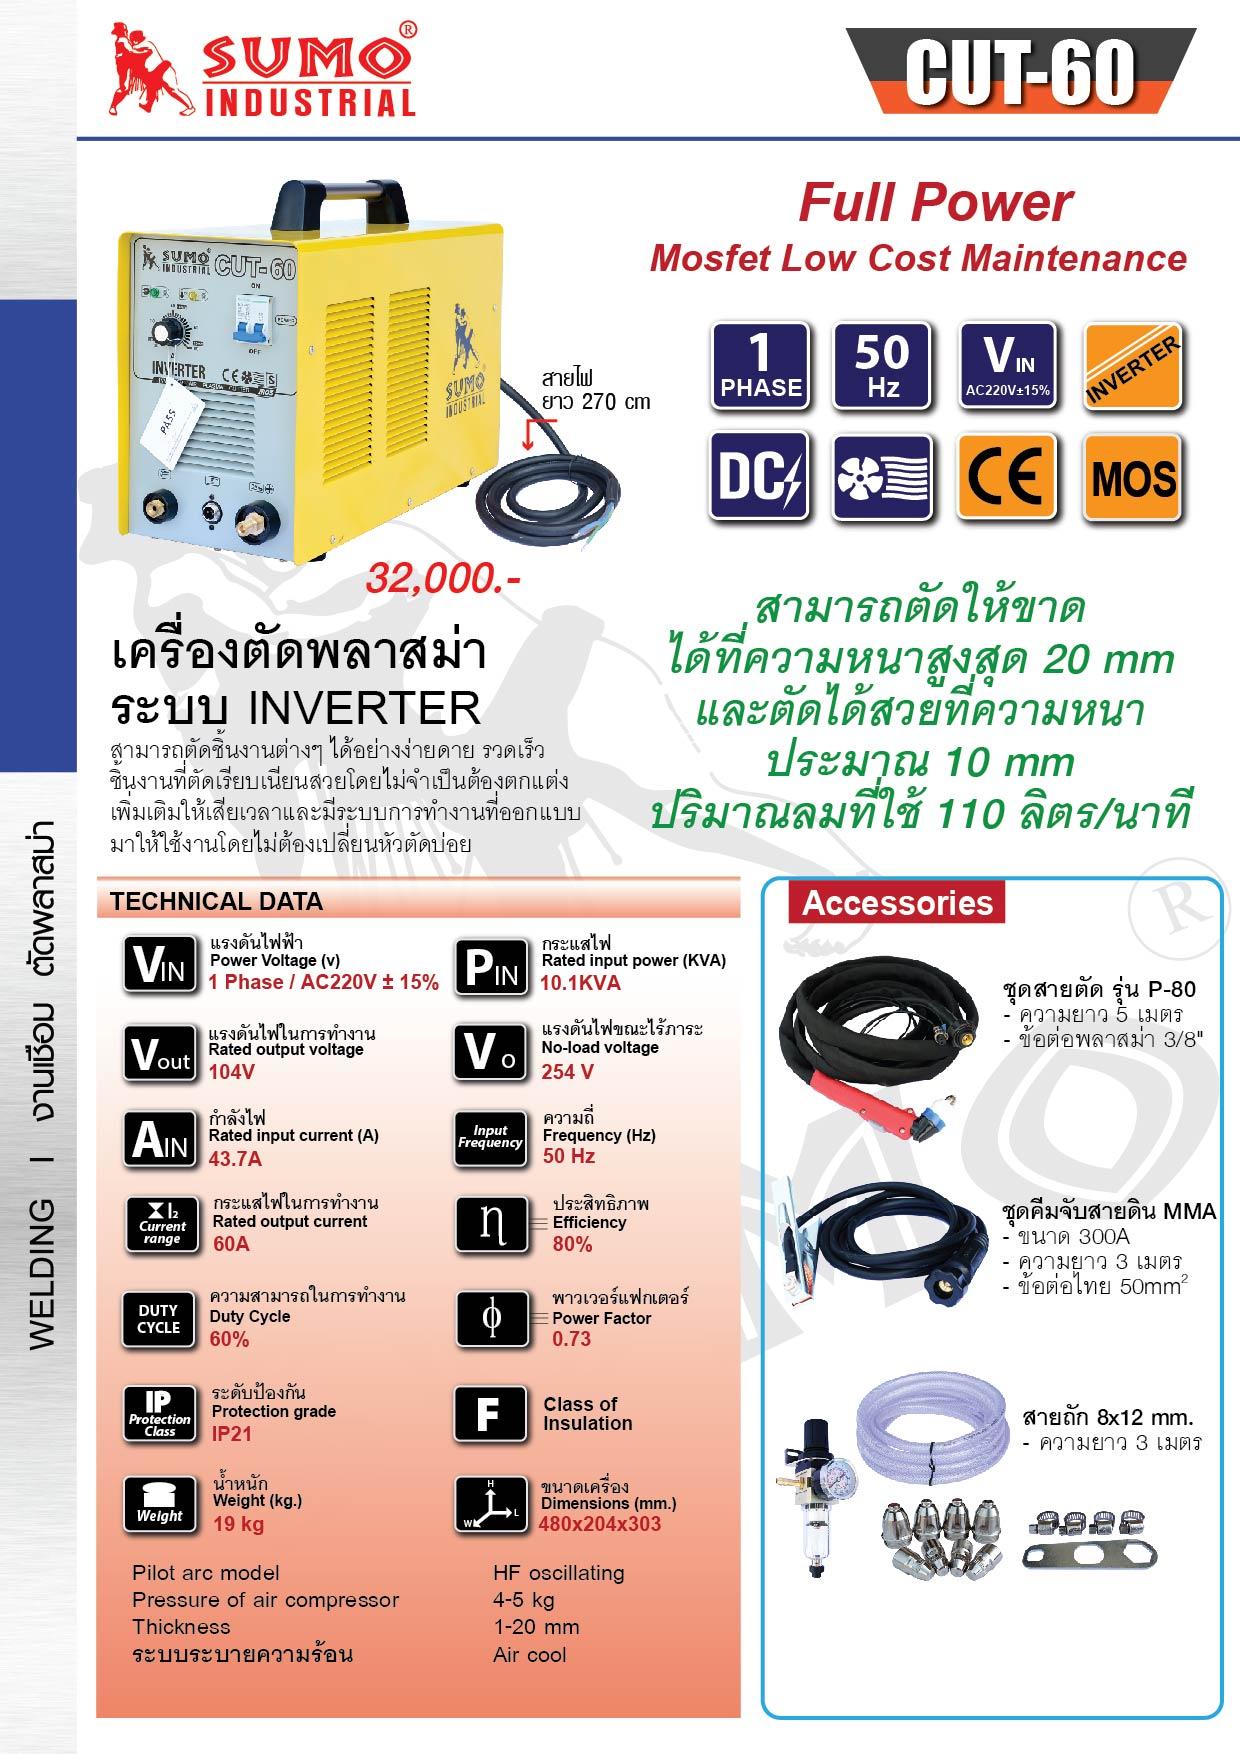 (40/239)  Accessories